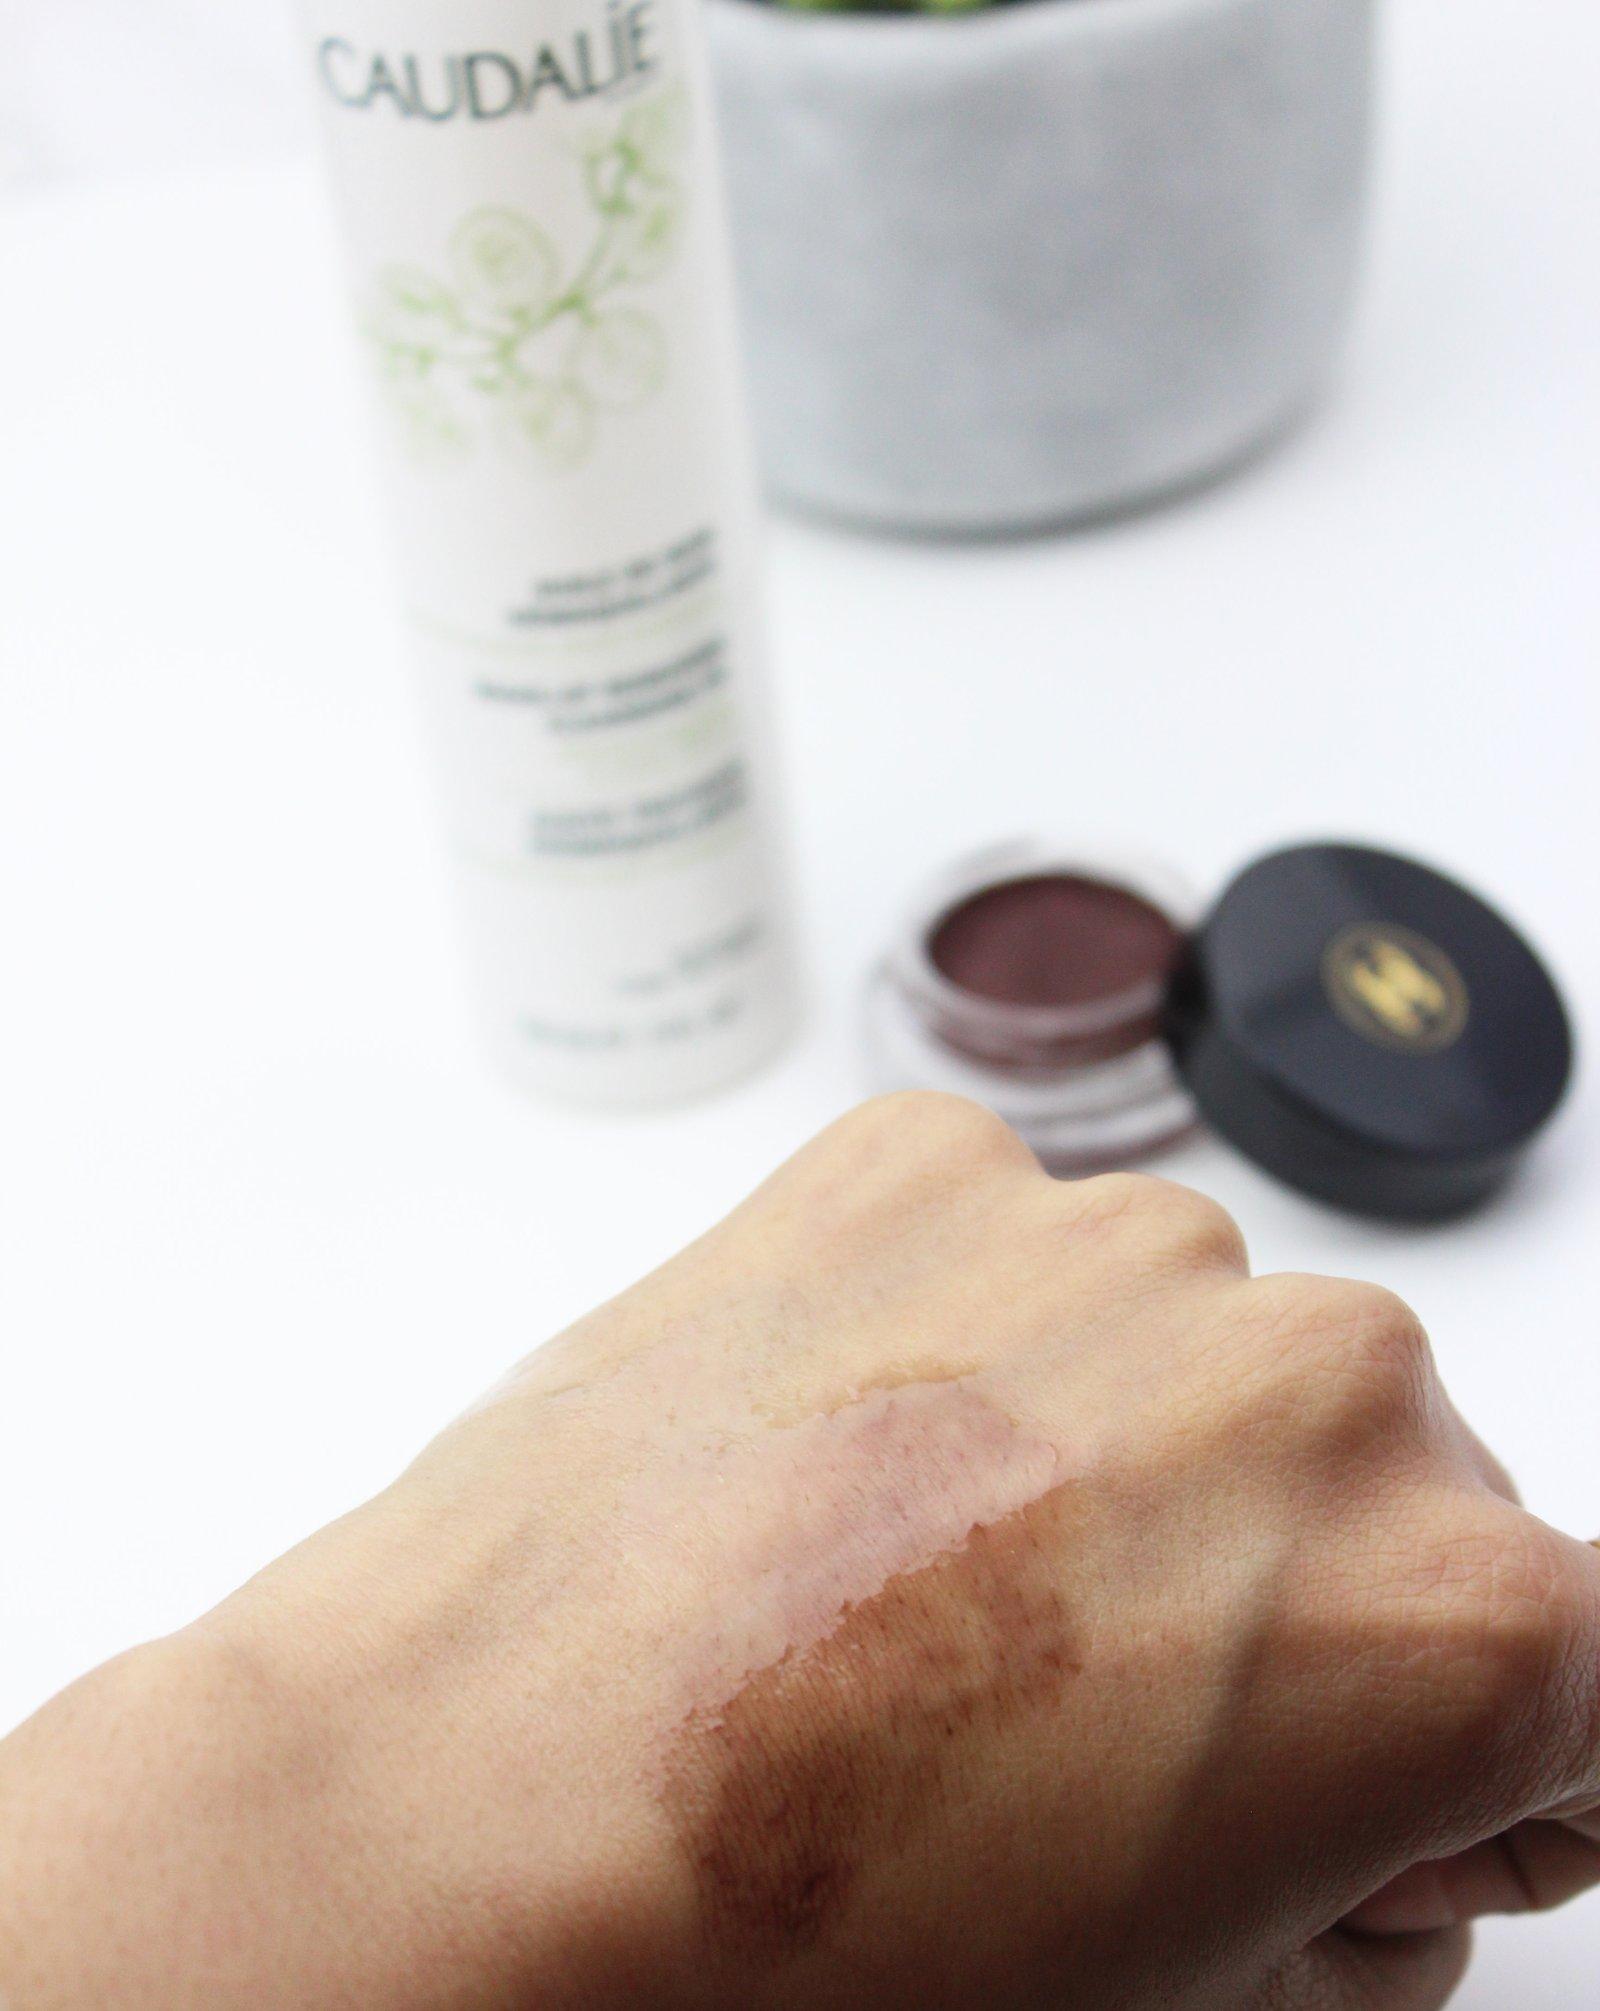 Caudalie Makeup removing cleansing oil demo - Ms Tantrum Blog